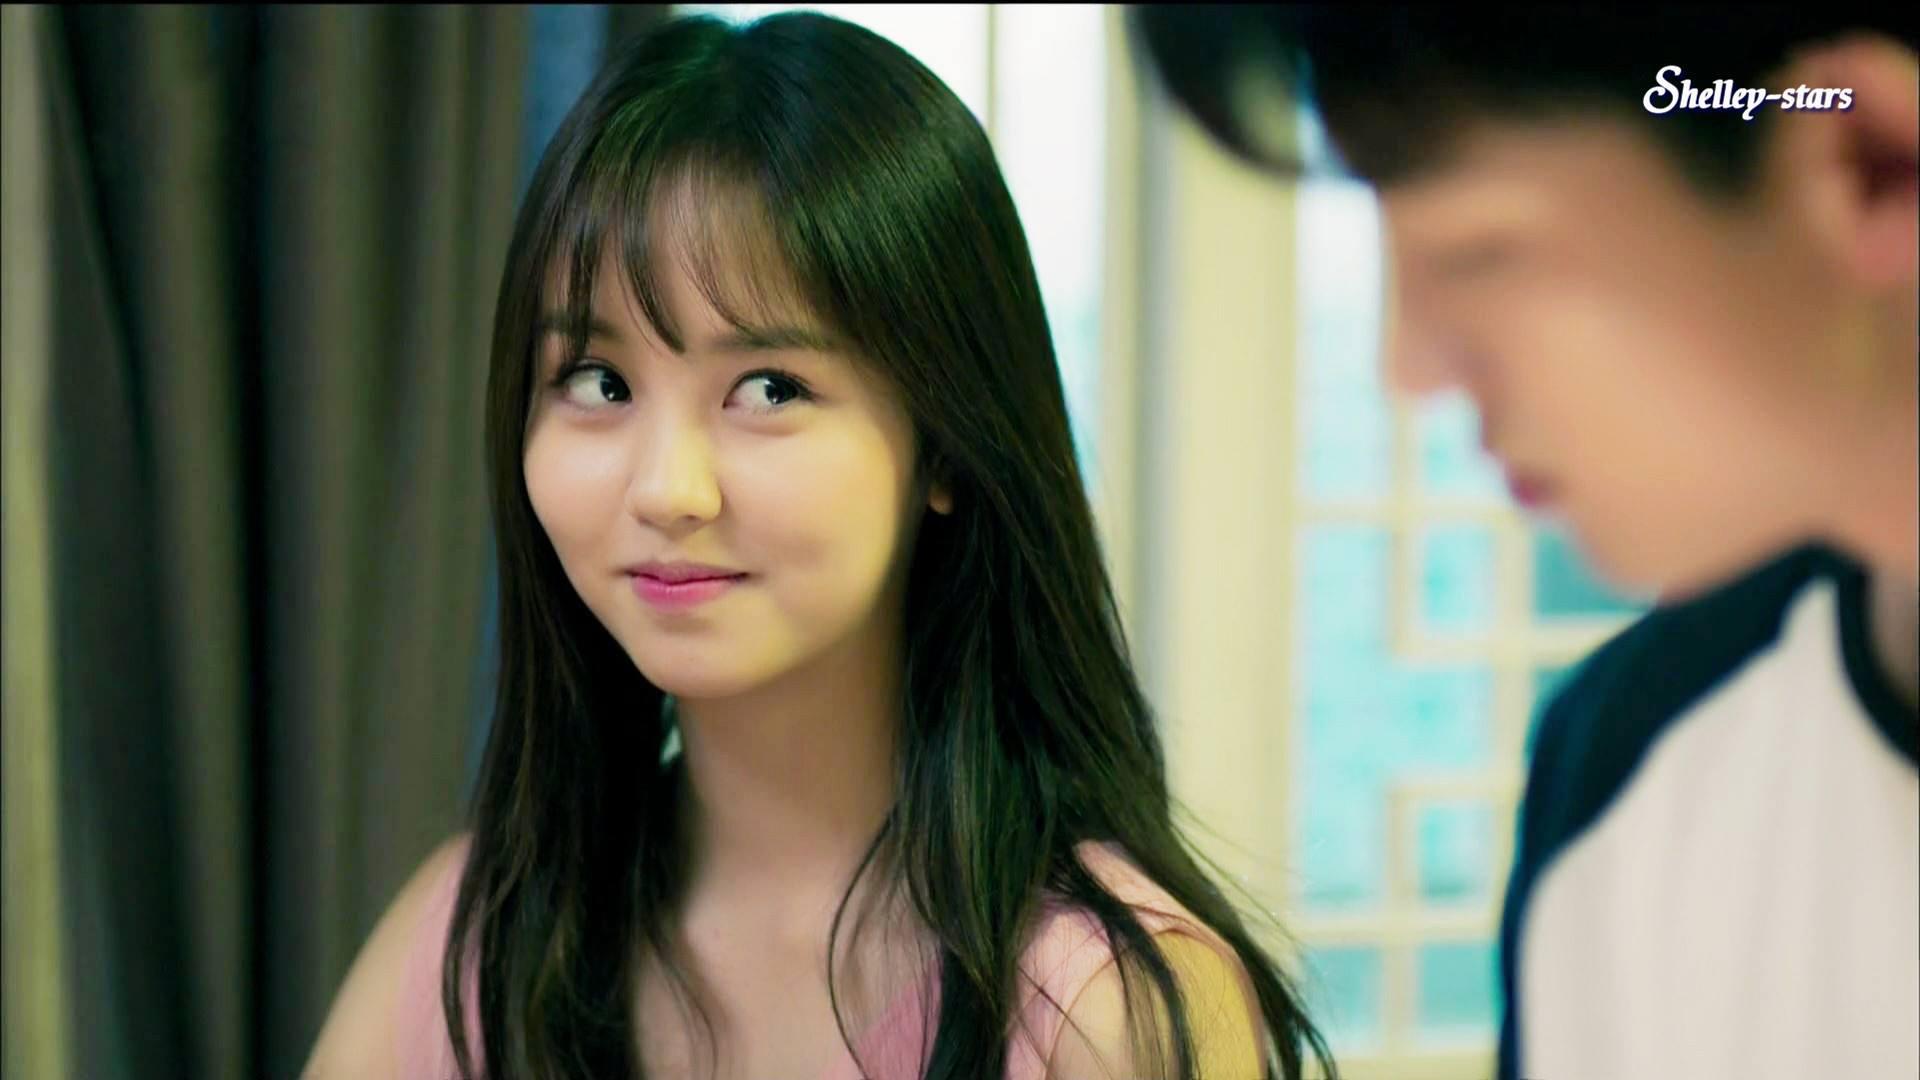 97 Kim So Hyun Smartphone Wallpaper Hd Album On Imgur Kim So Hyun